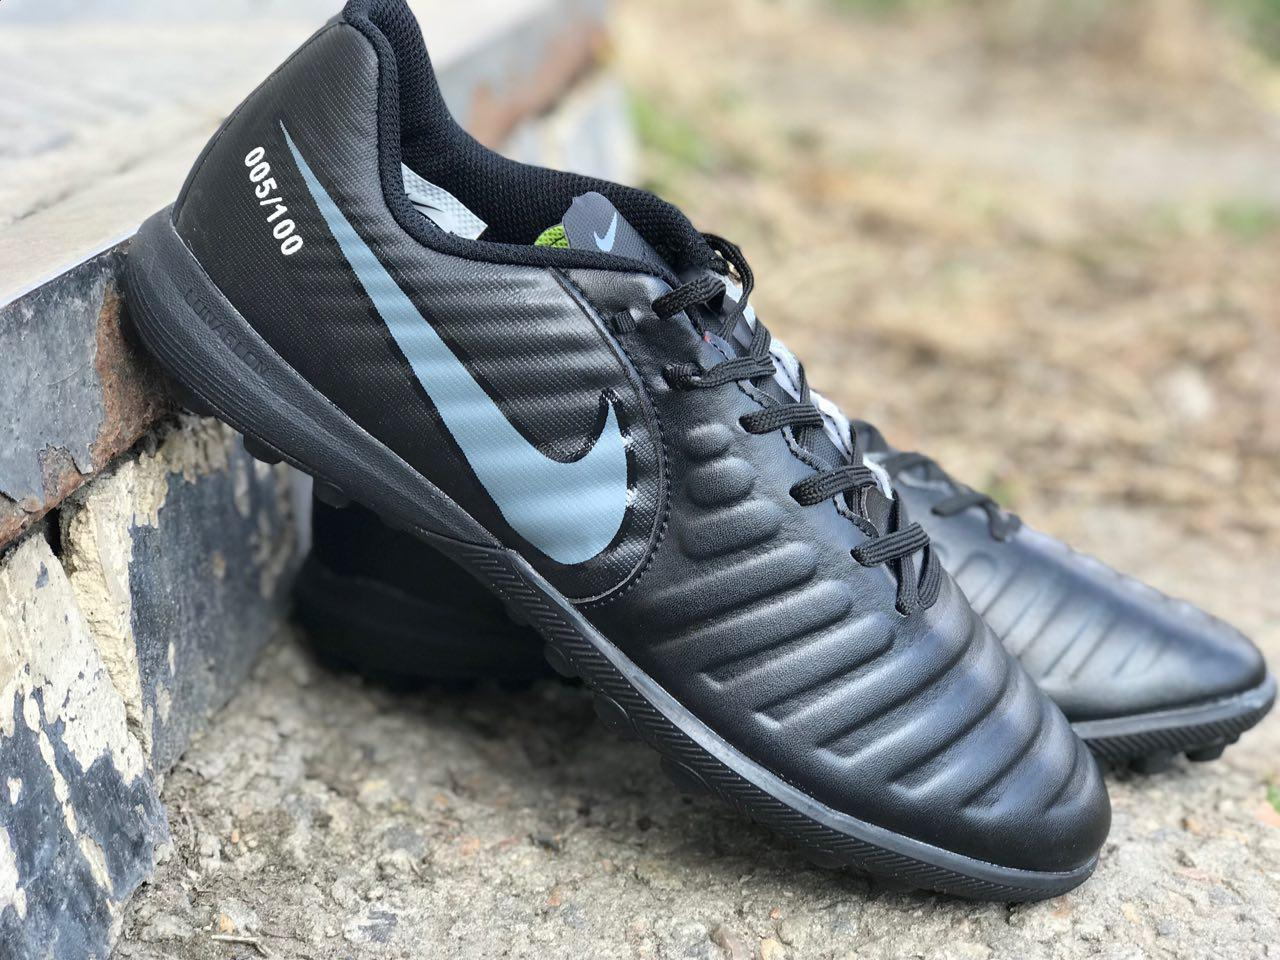 Сороконожки Nike Tiempo Х 1129 реплика